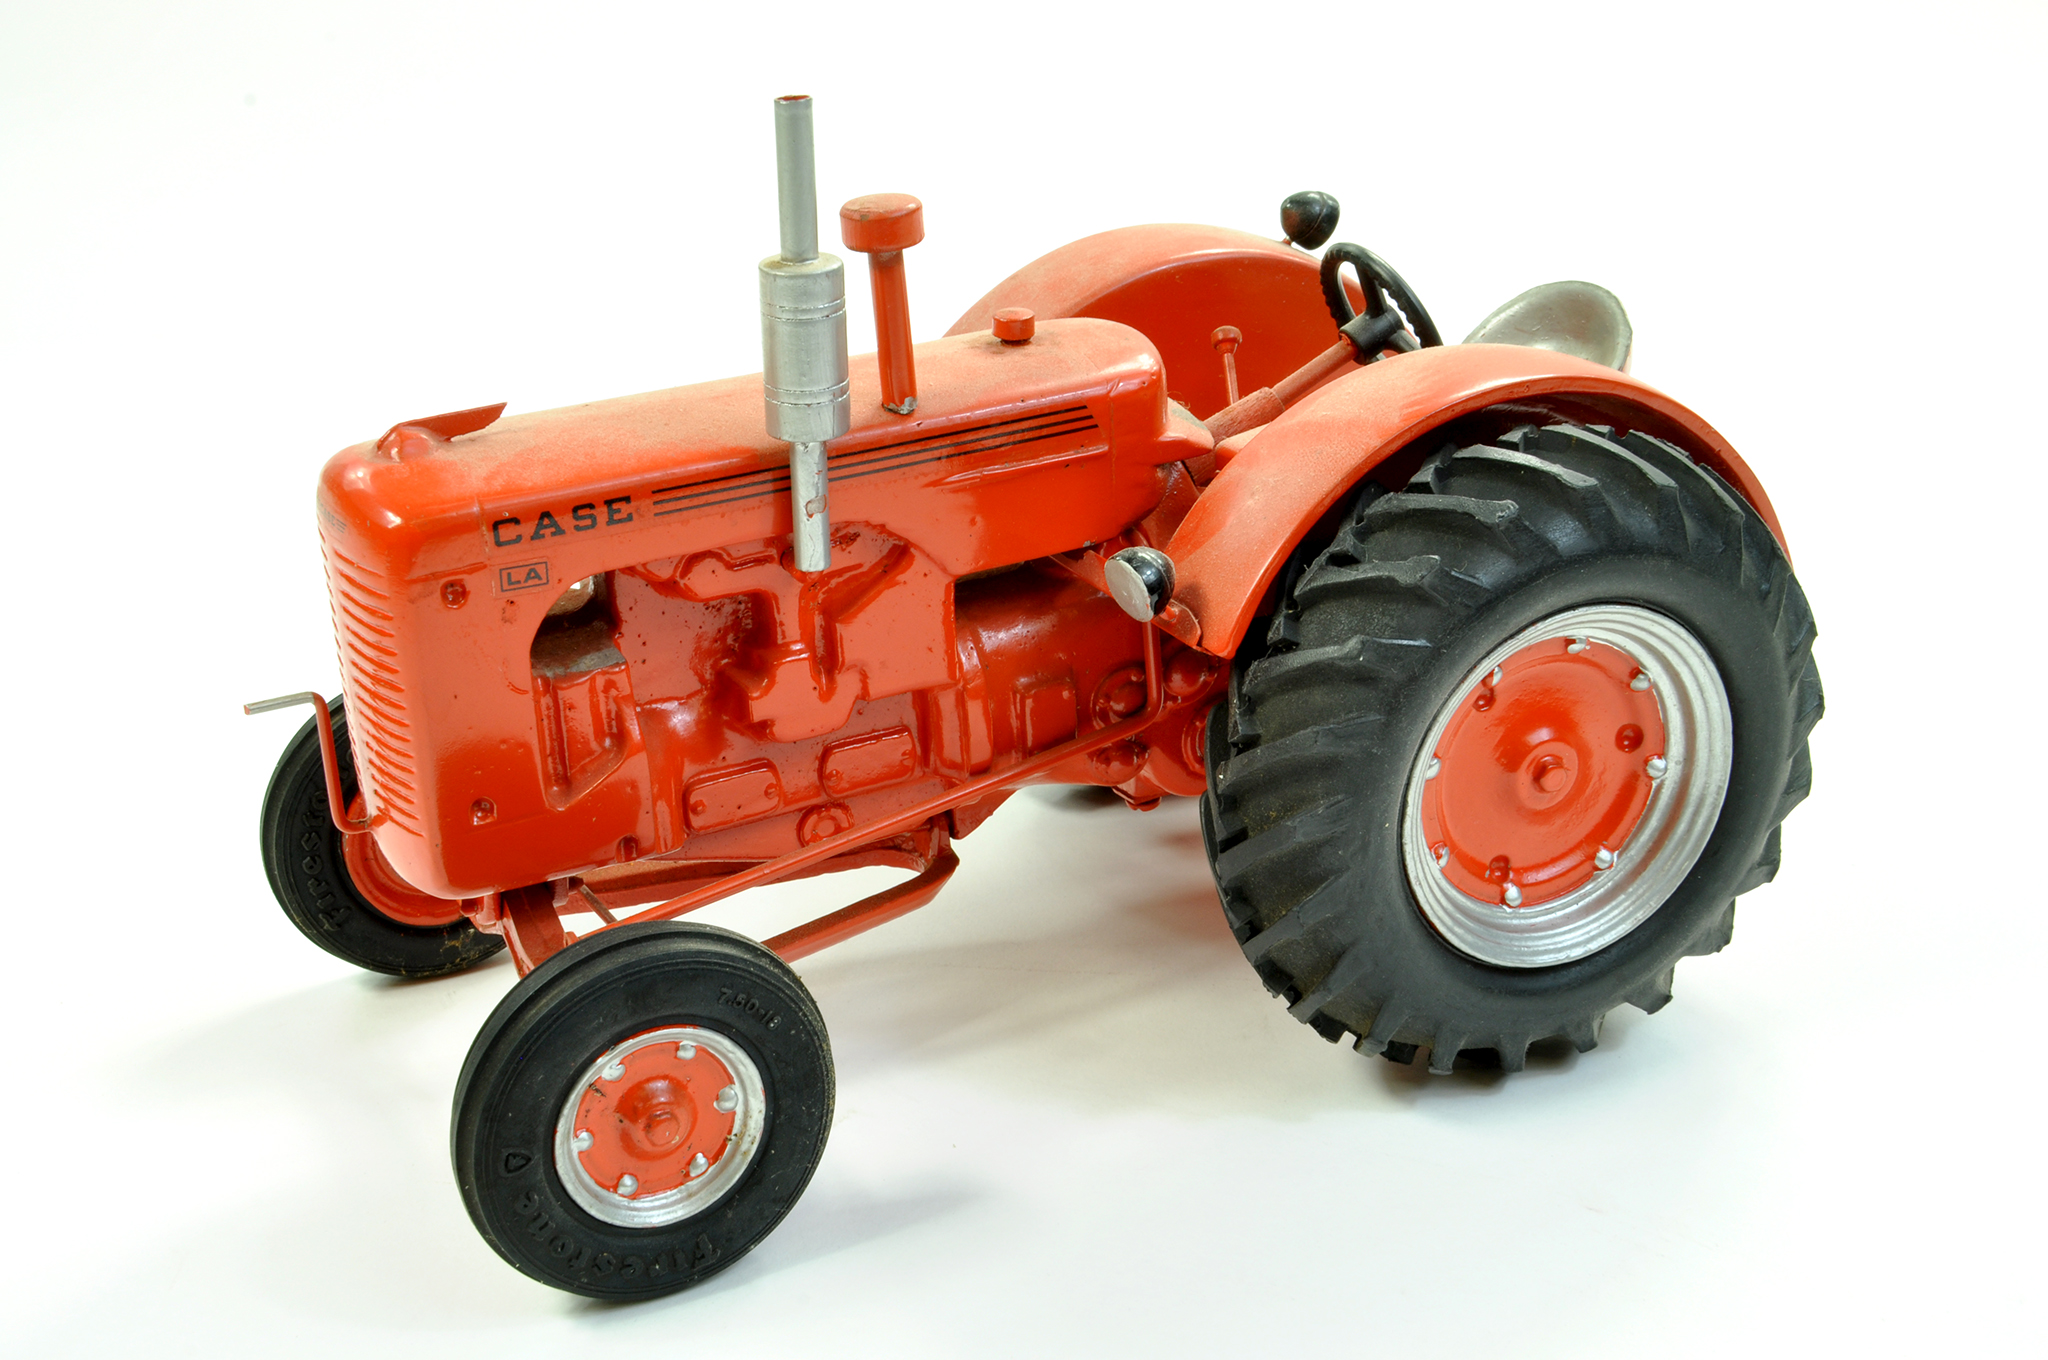 Lot 4 - Lyle Dingman (Gilson Riecke) 1/16 diecast (heavy) Case LA Tractor. Generally very good to